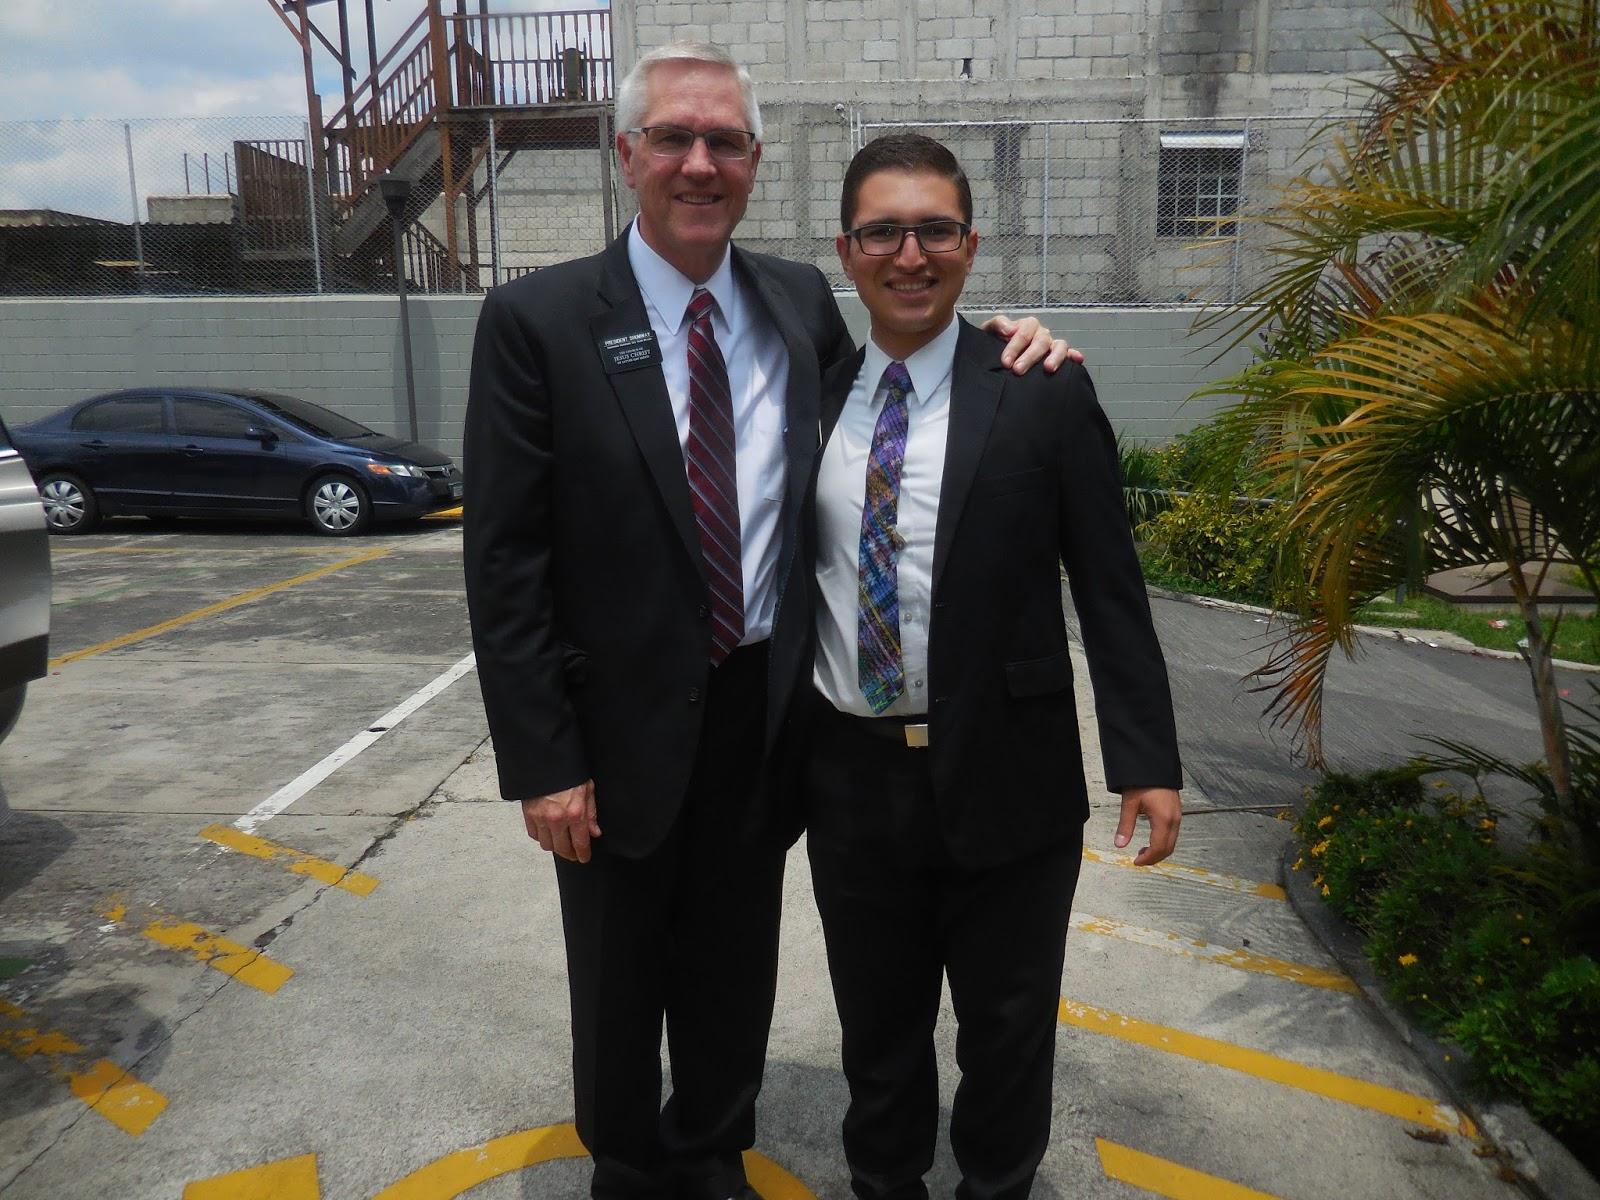 Mormon elders get pegged